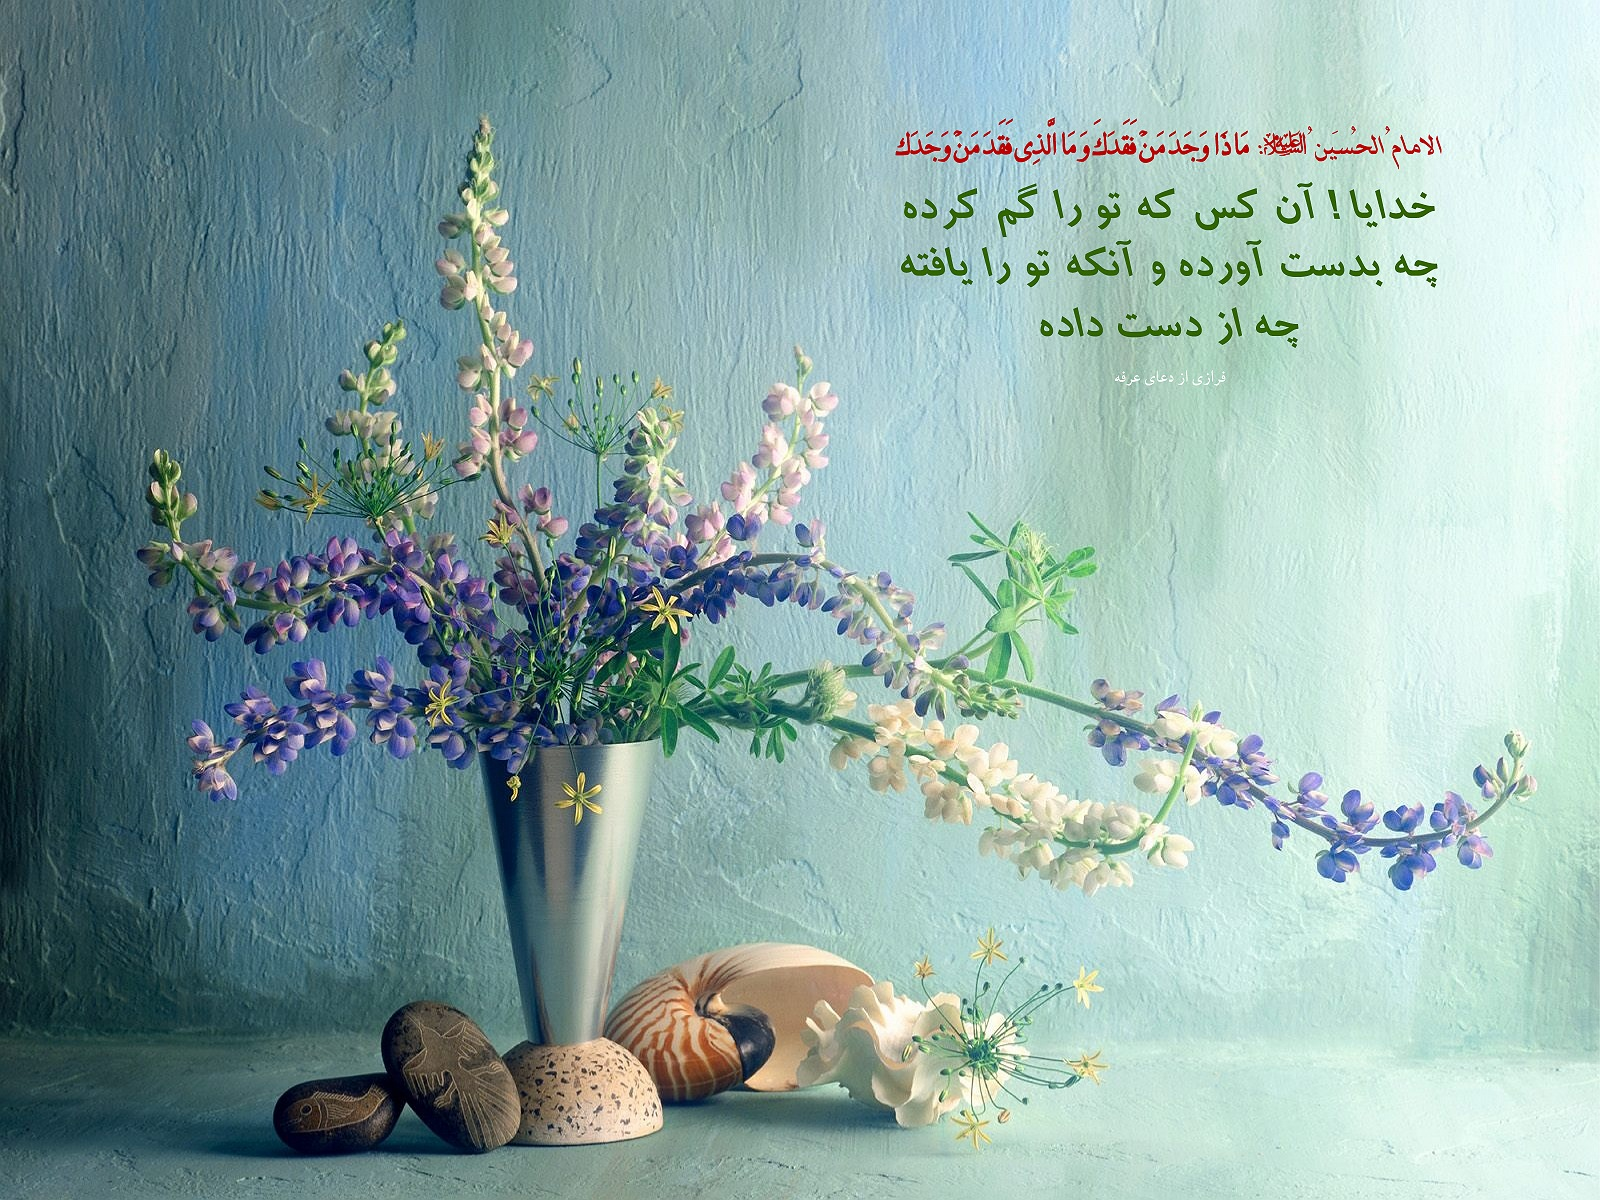 http://uupload.ir/files/qmbr_641hadis_h109.jpg